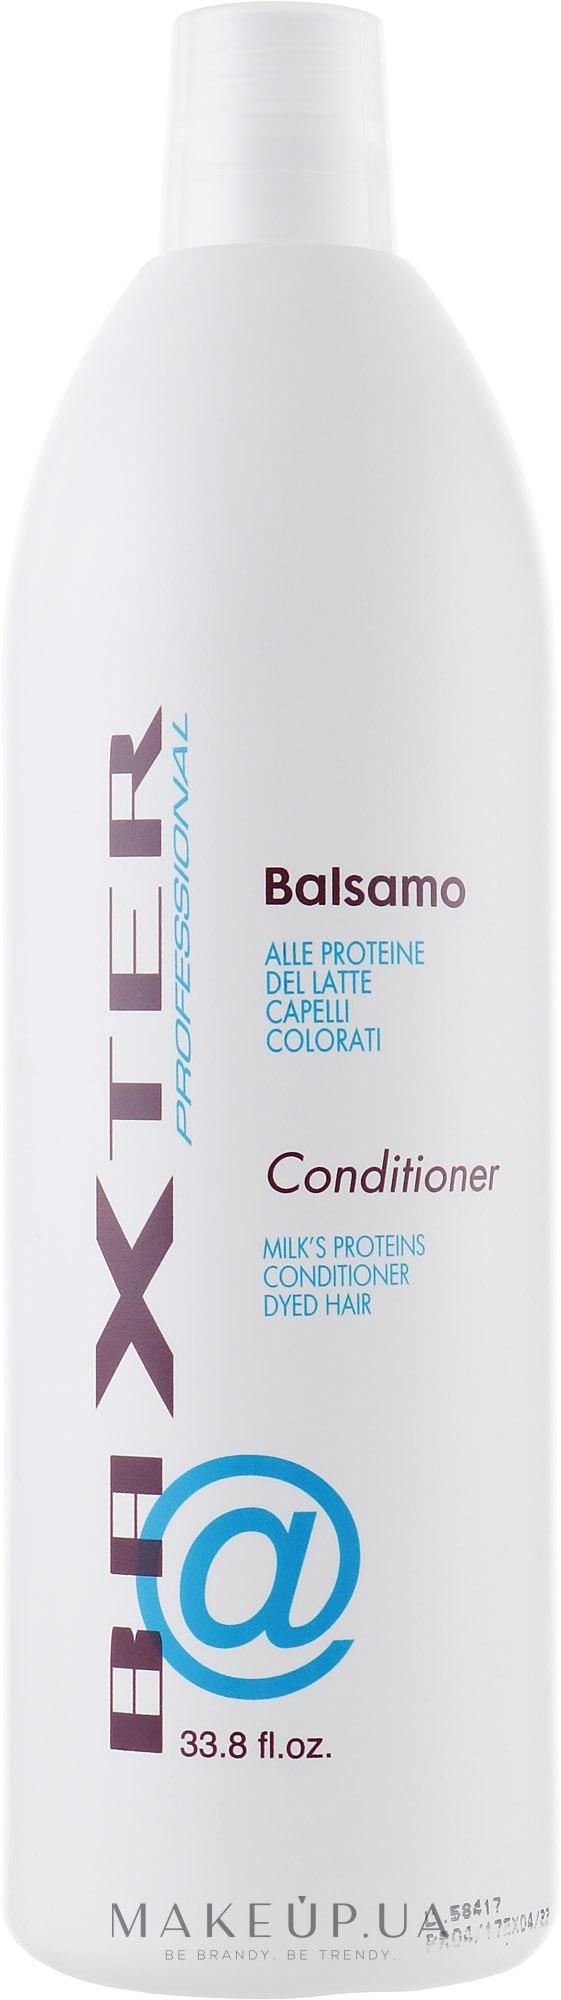 Бальзам-кондиціонер - Baxter Advanced Professional Hair Care Milk Proteins Conditioner — фото 1000ml